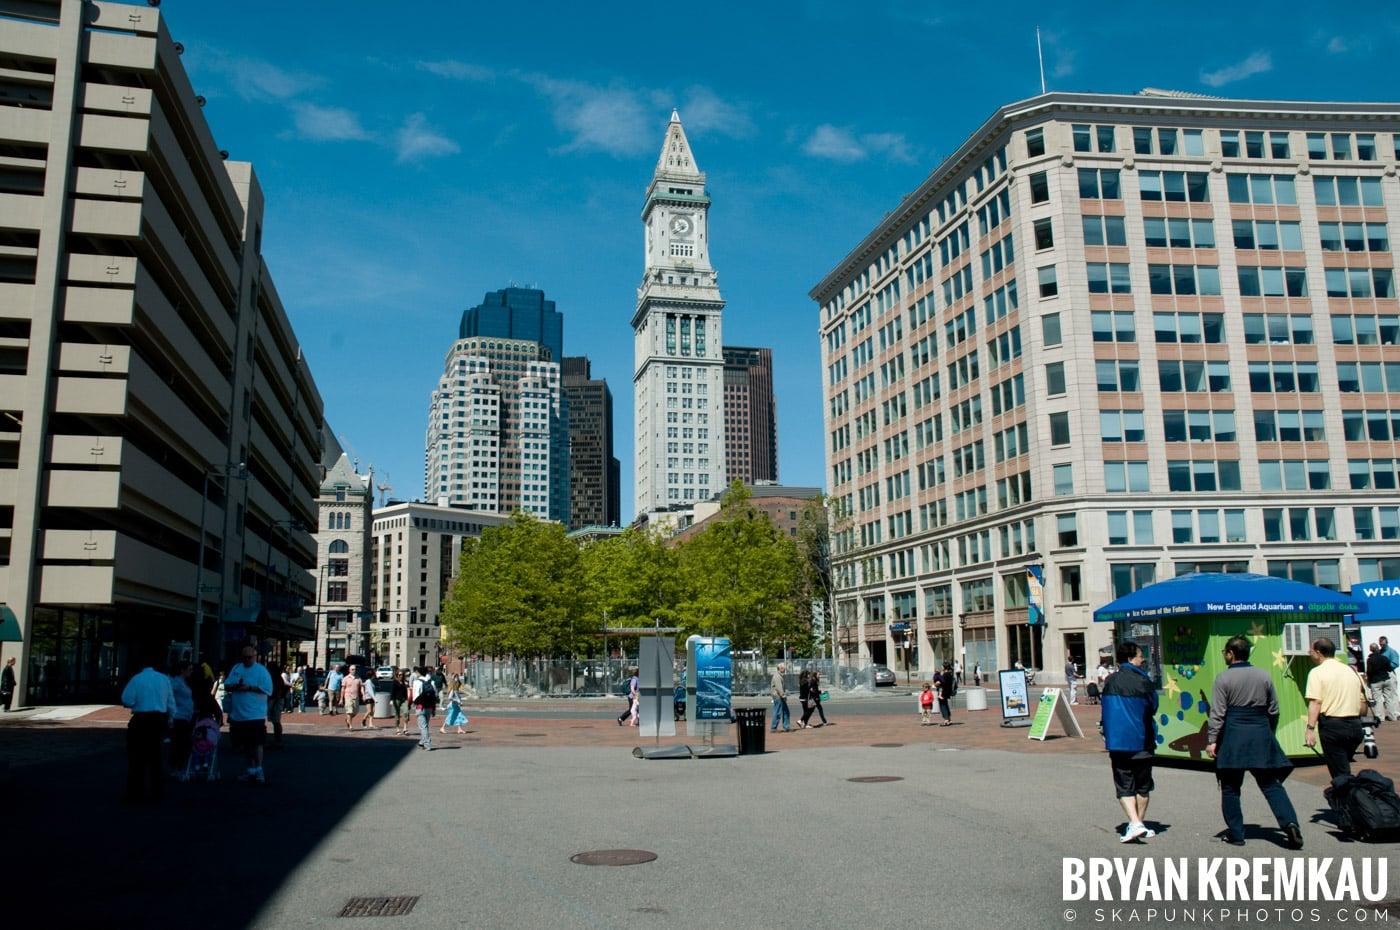 Memorial Day Weekend Trip to Boston - 5.25.08 (24)